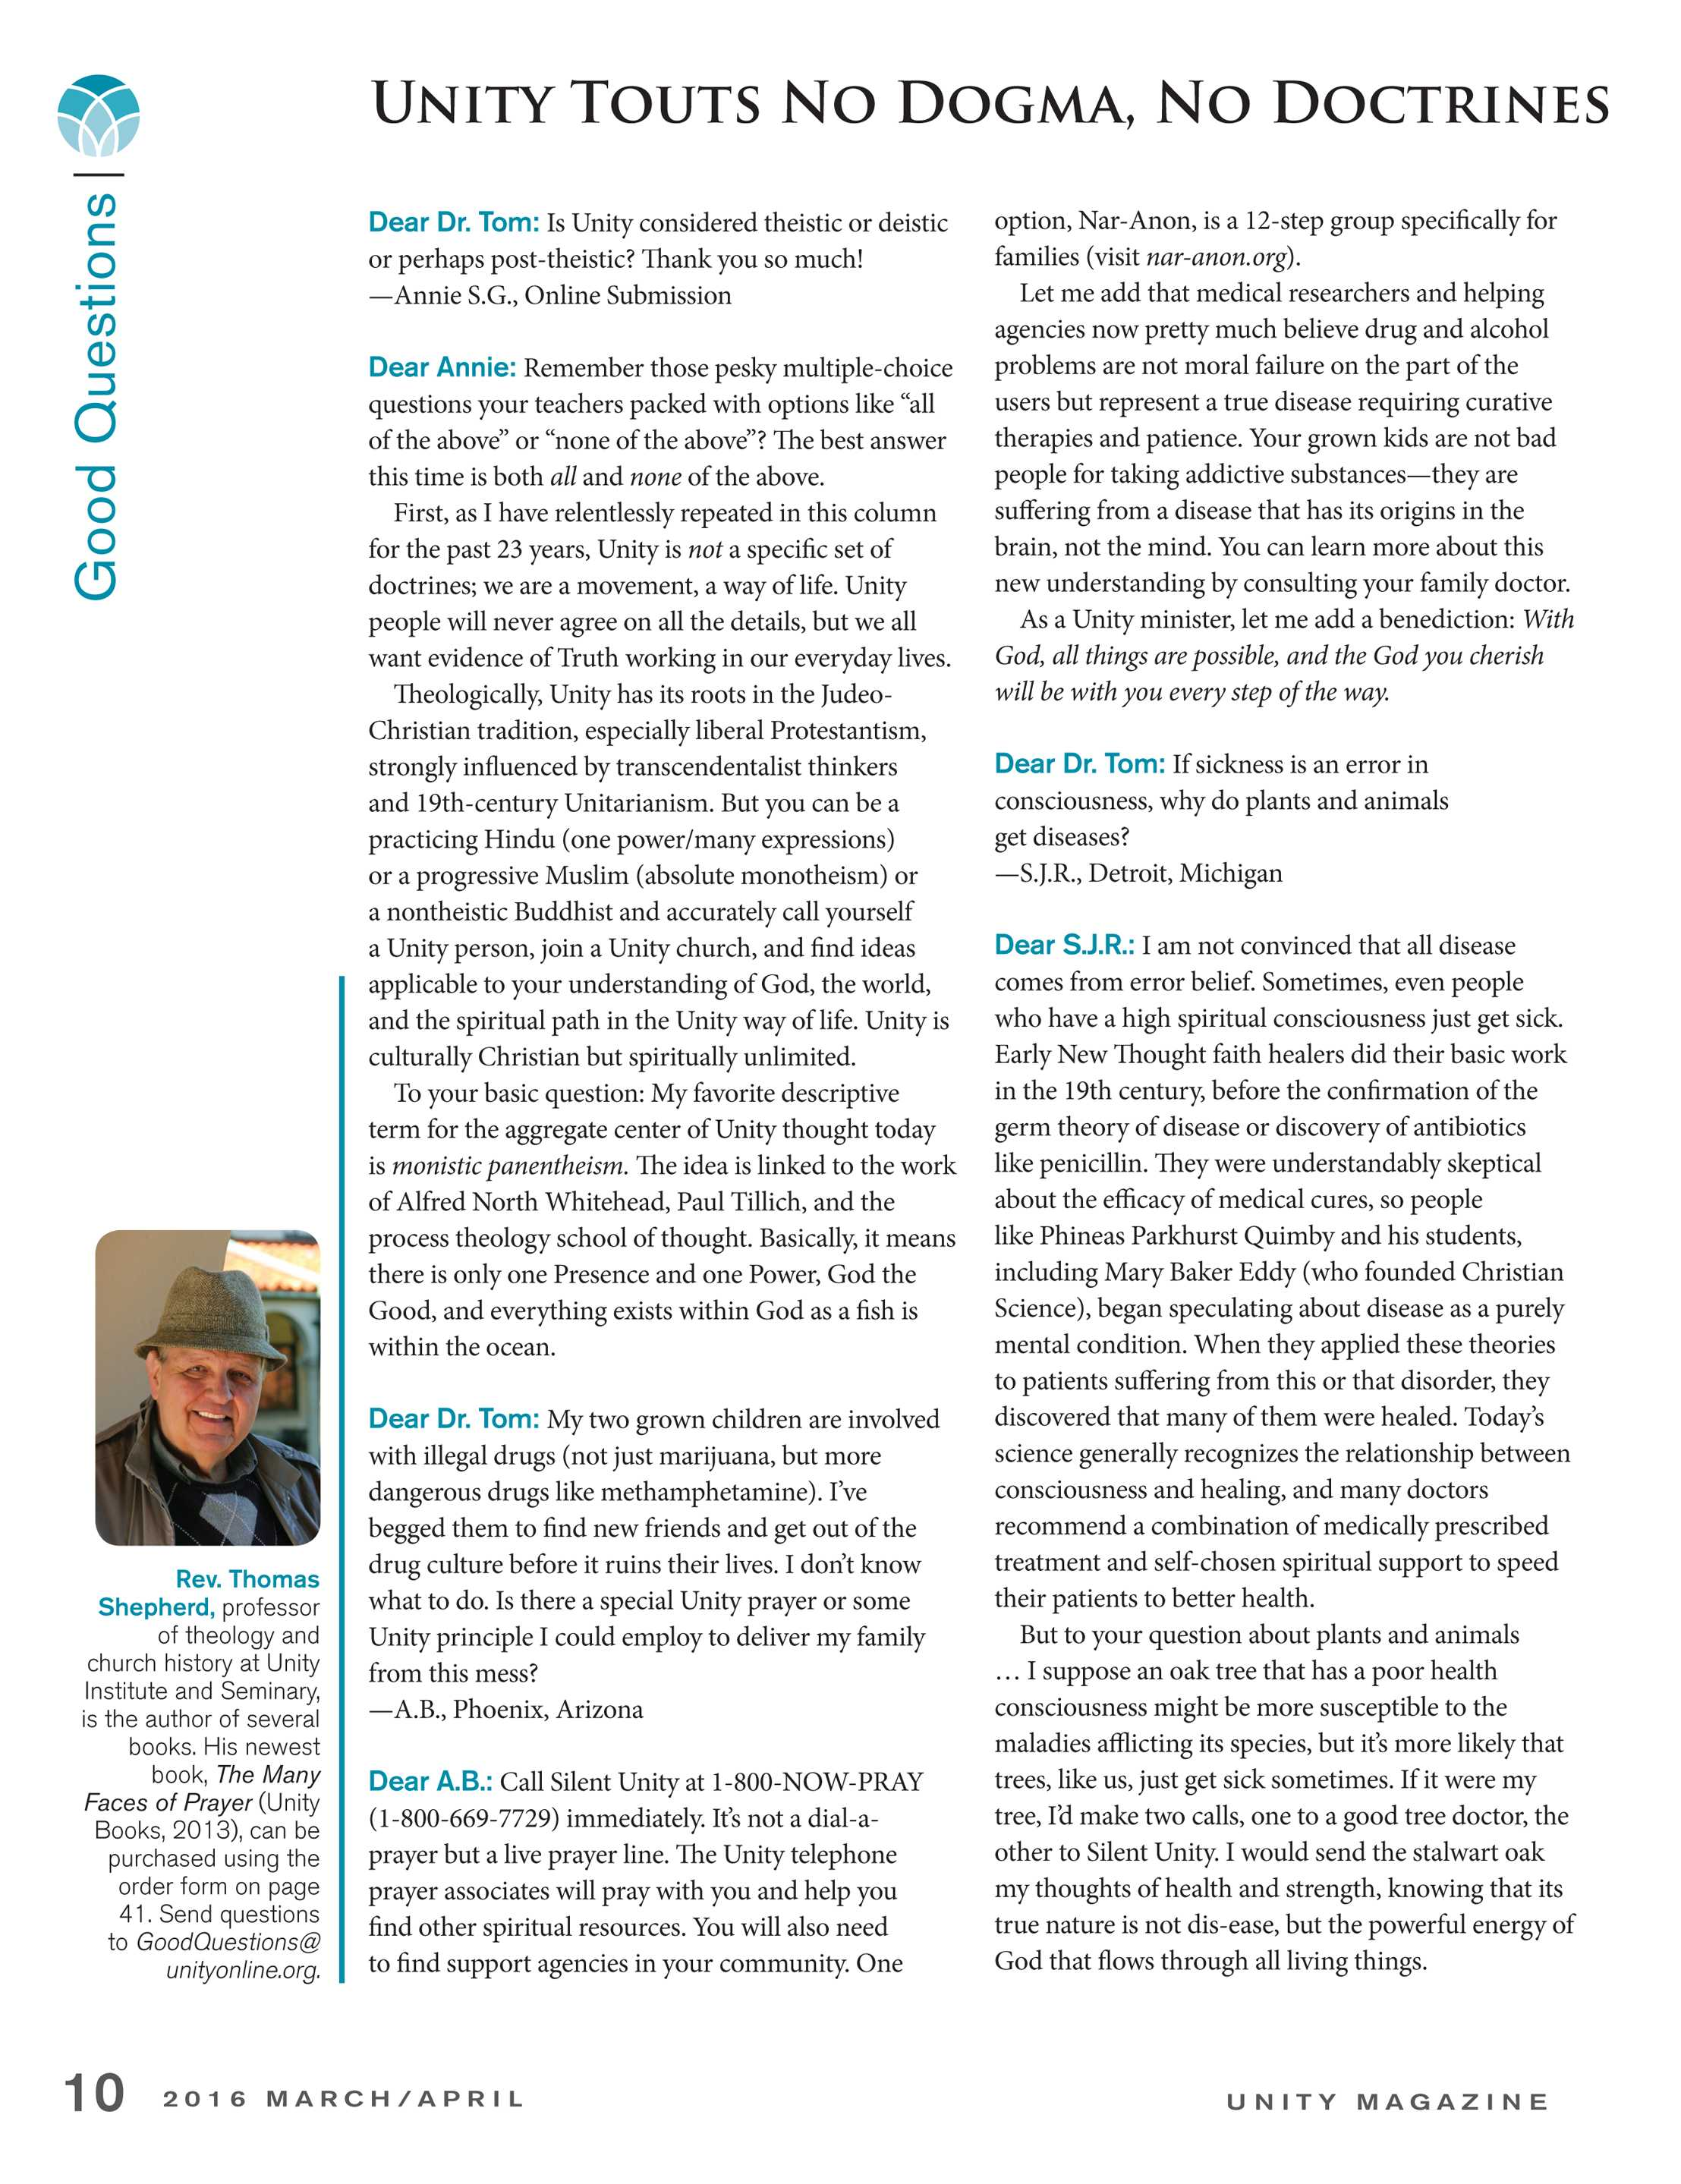 Unity Magazine - March/April 2016 - page 11